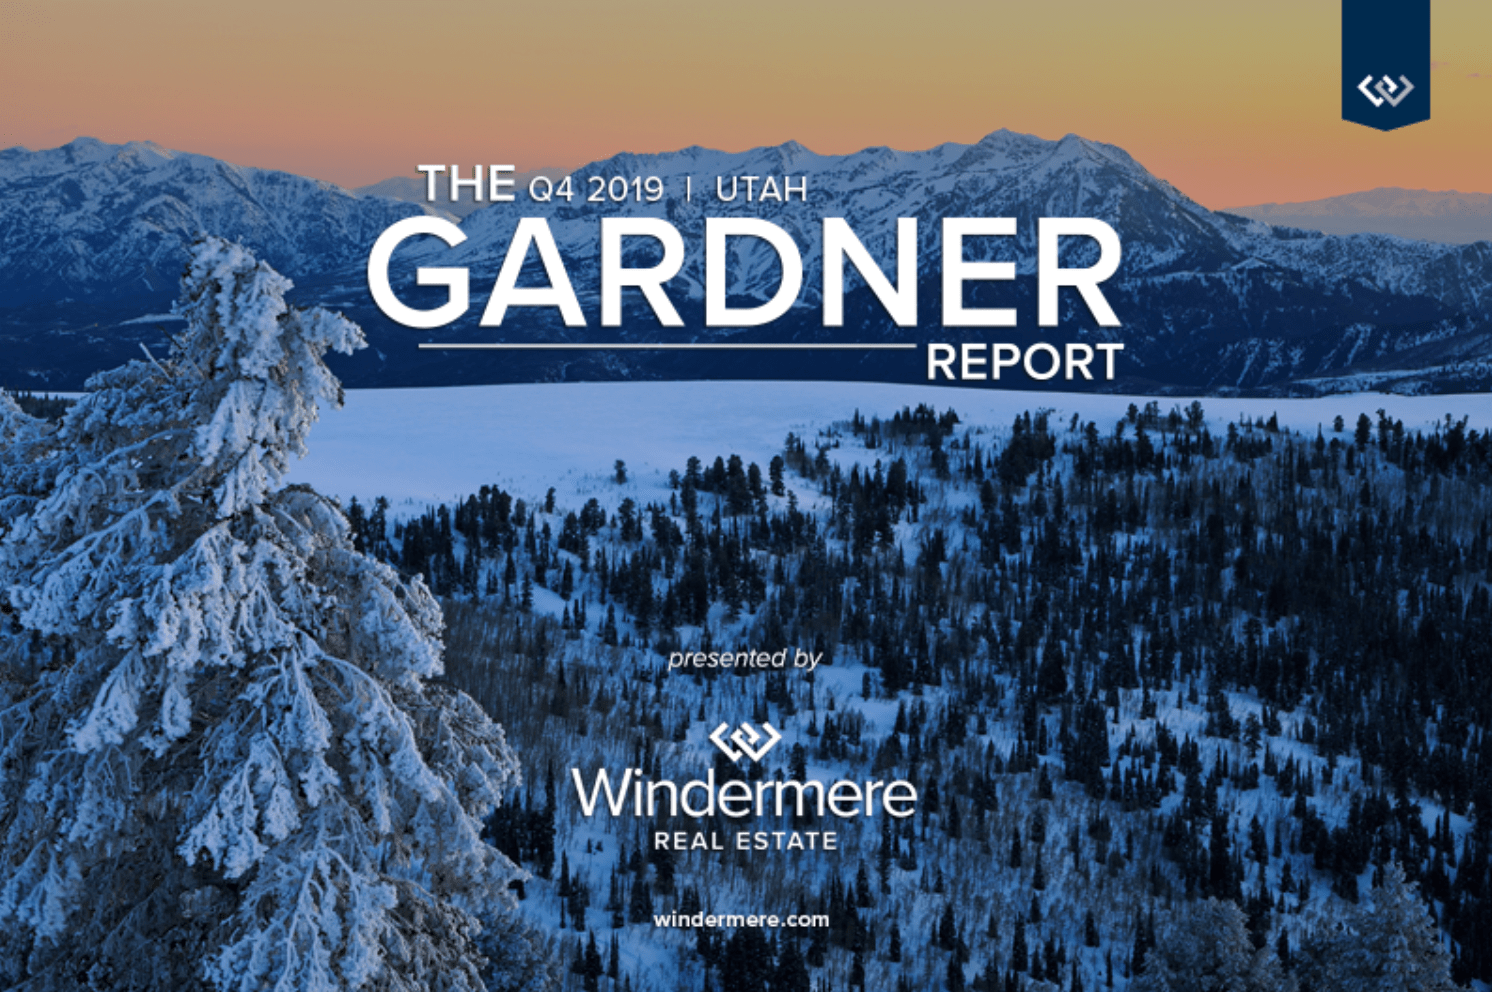 The Gardner Report – 2019 Fourth Quarter